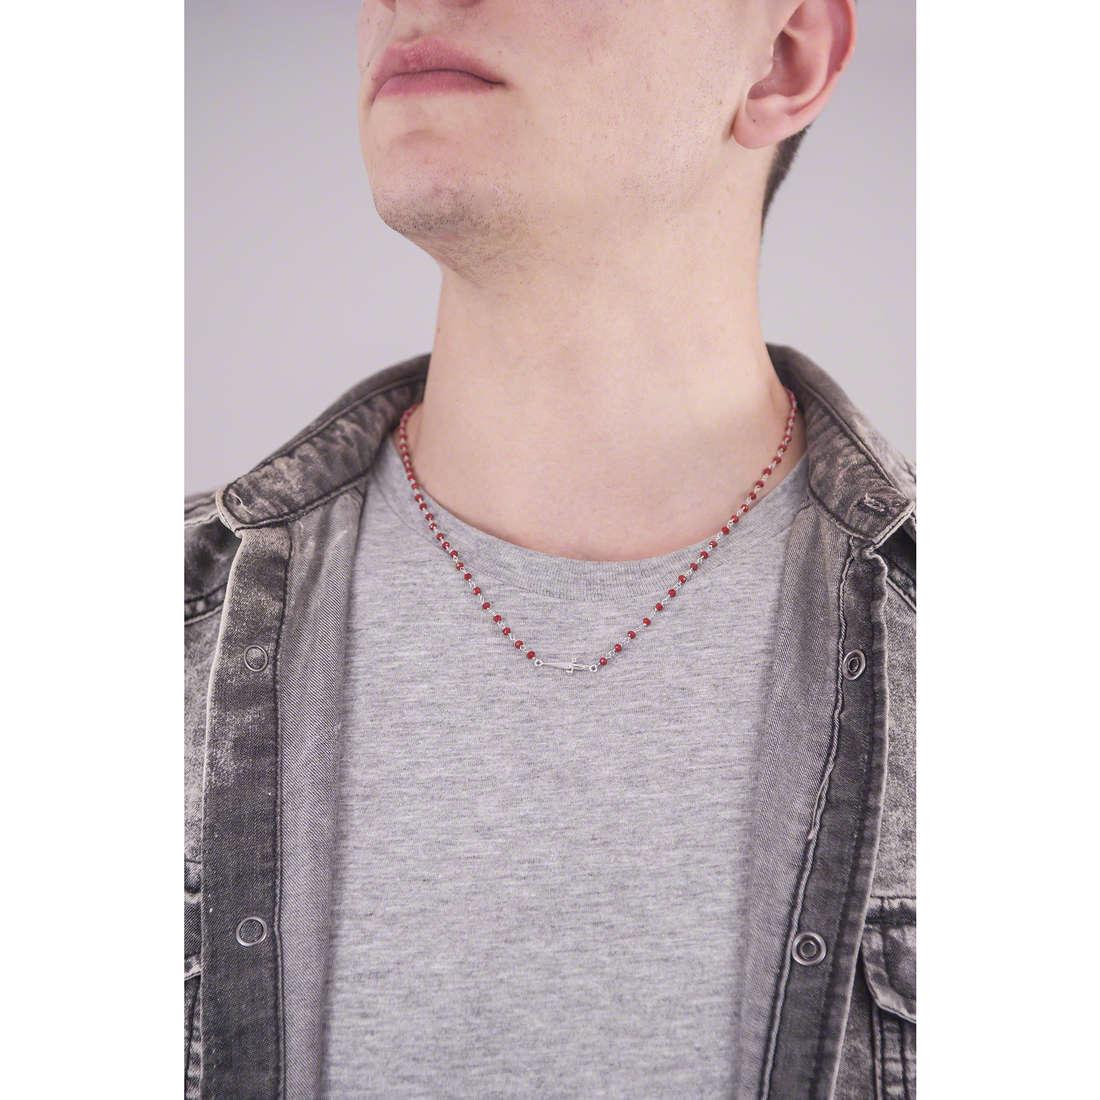 Cesare Paciotti necklaces Ornament man JPCL1119B indosso